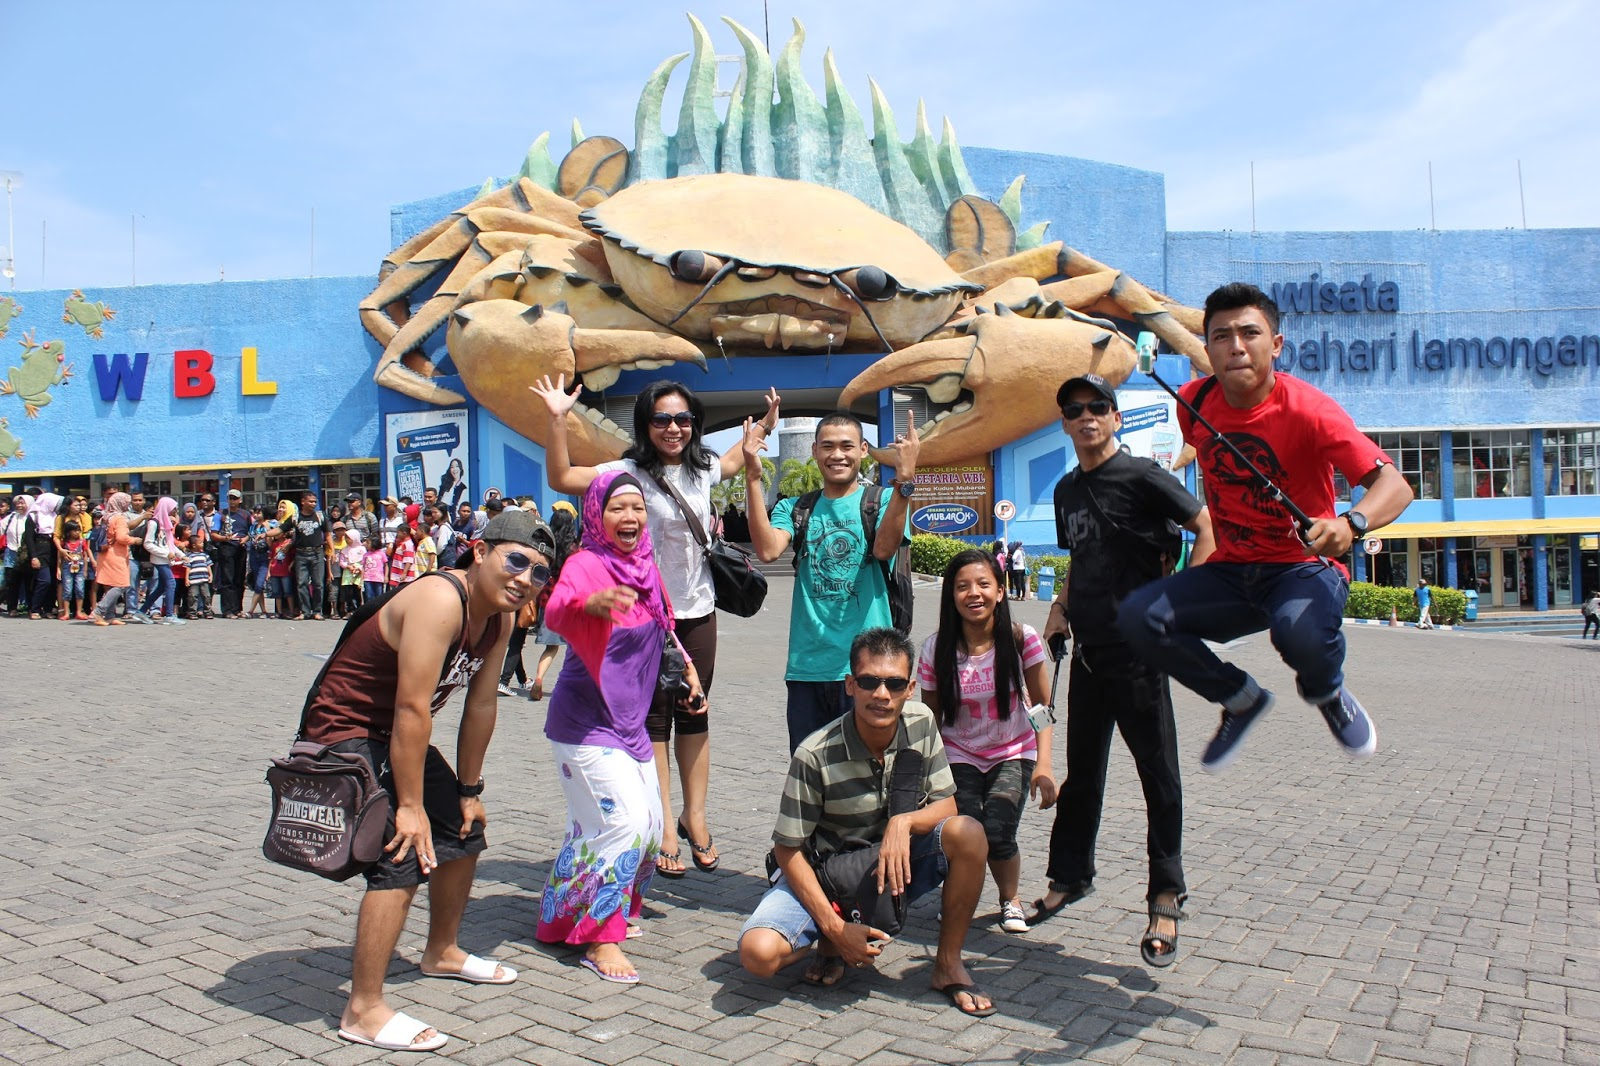 Update Wisata Jatim: Harga Tiket Masuk WBL (Wisata Bahari Lamongan